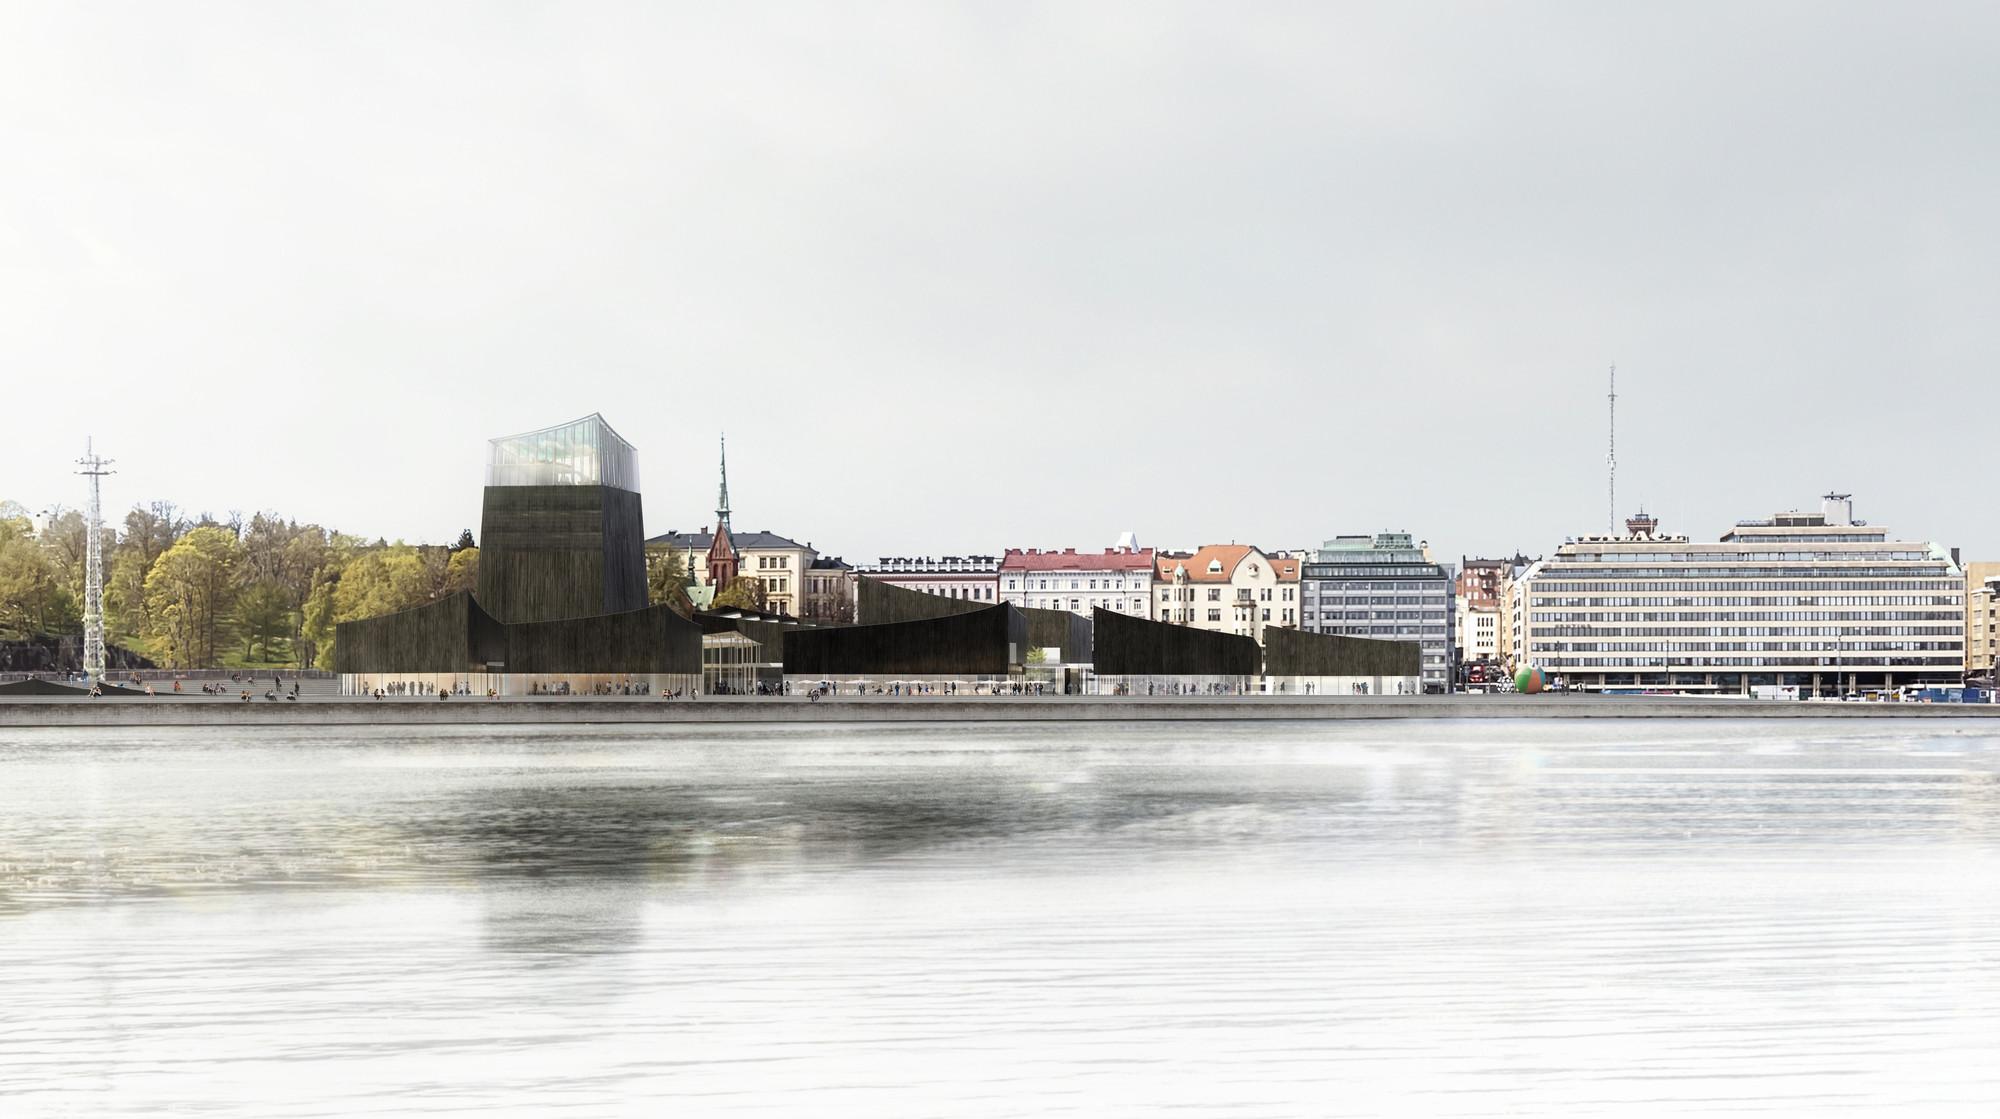 Proposta de Moreau Kusunoki vence o concurso para o Guggenheim Helsinki , Proposta Vencedora. Imagem © Moreau Kusunoki Architectes / Guggenheim